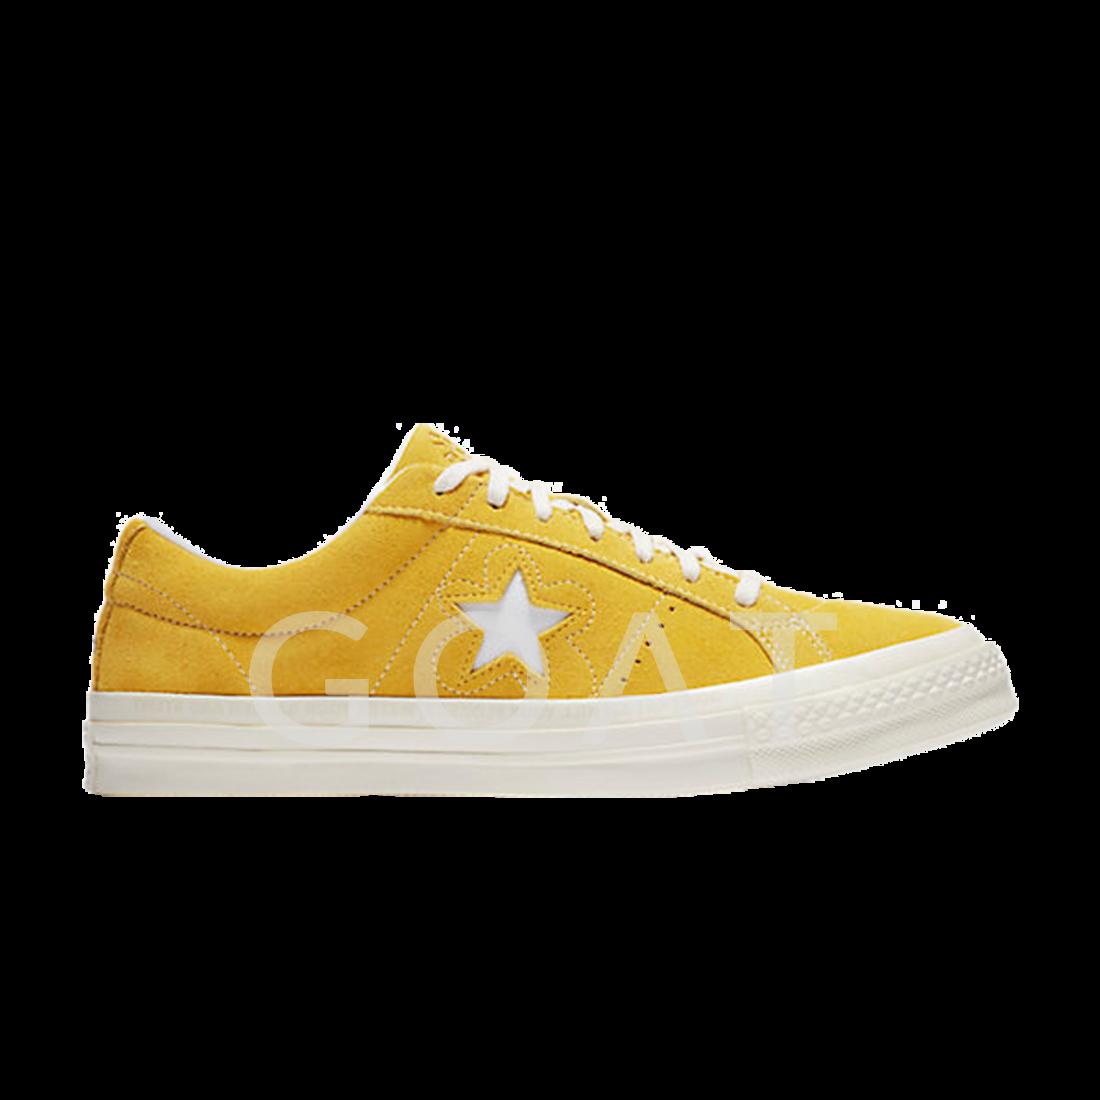 Golf Le Fleur X One Star Suede Converse 159435c Yellow Goat